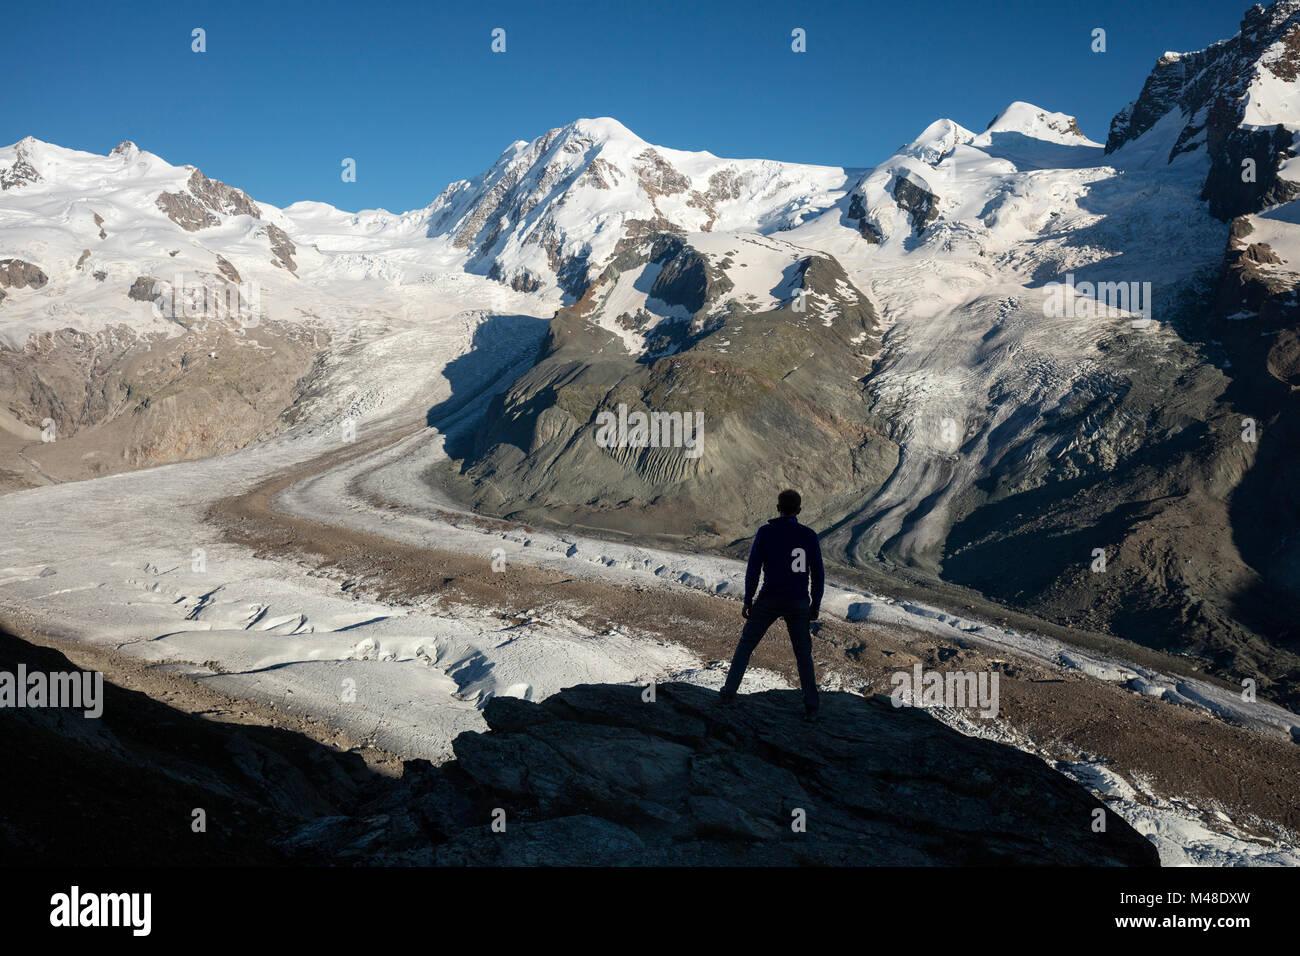 Hiker silhouetted beside Gorner Glacier and Monte Rosa, Gornergrat, Zermatt, Switzerland. - Stock Image